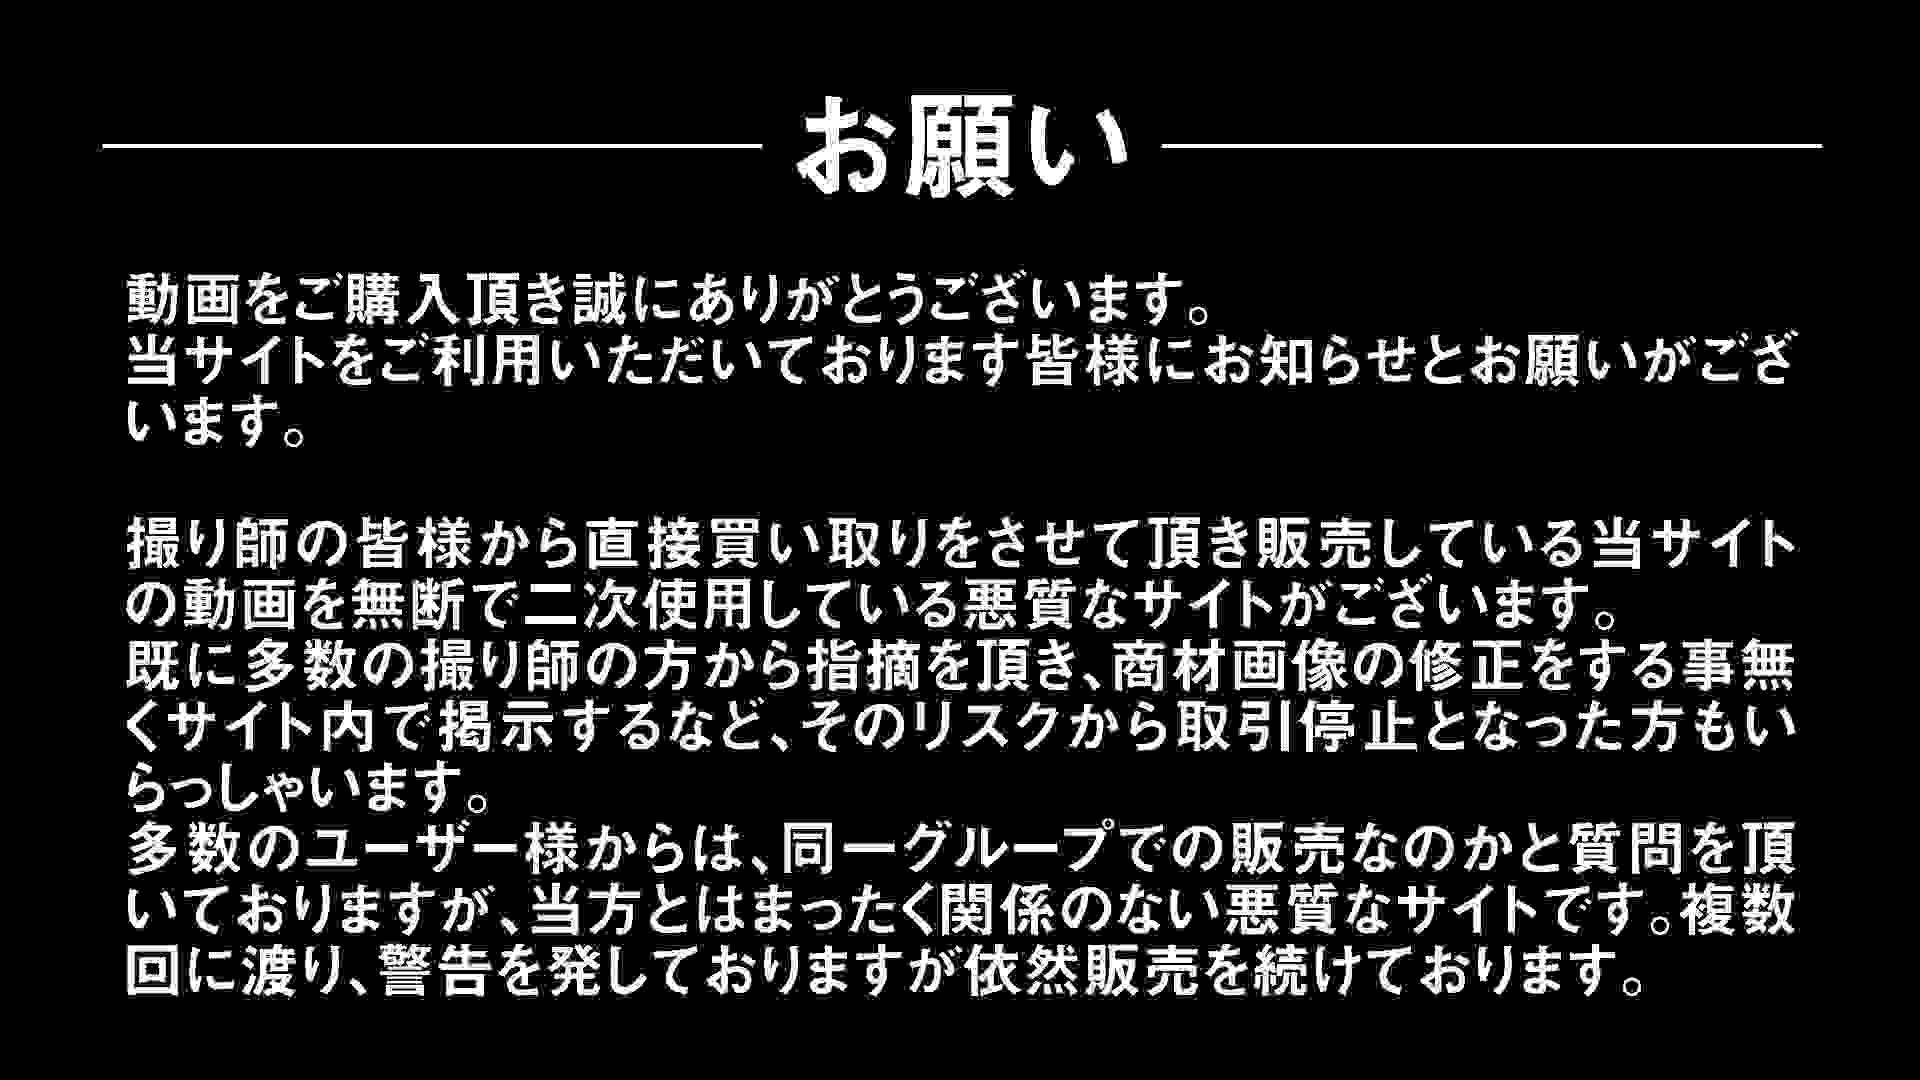 Aquaな露天風呂Vol.299 盗撮シリーズ | 露天風呂編  82PIX 1